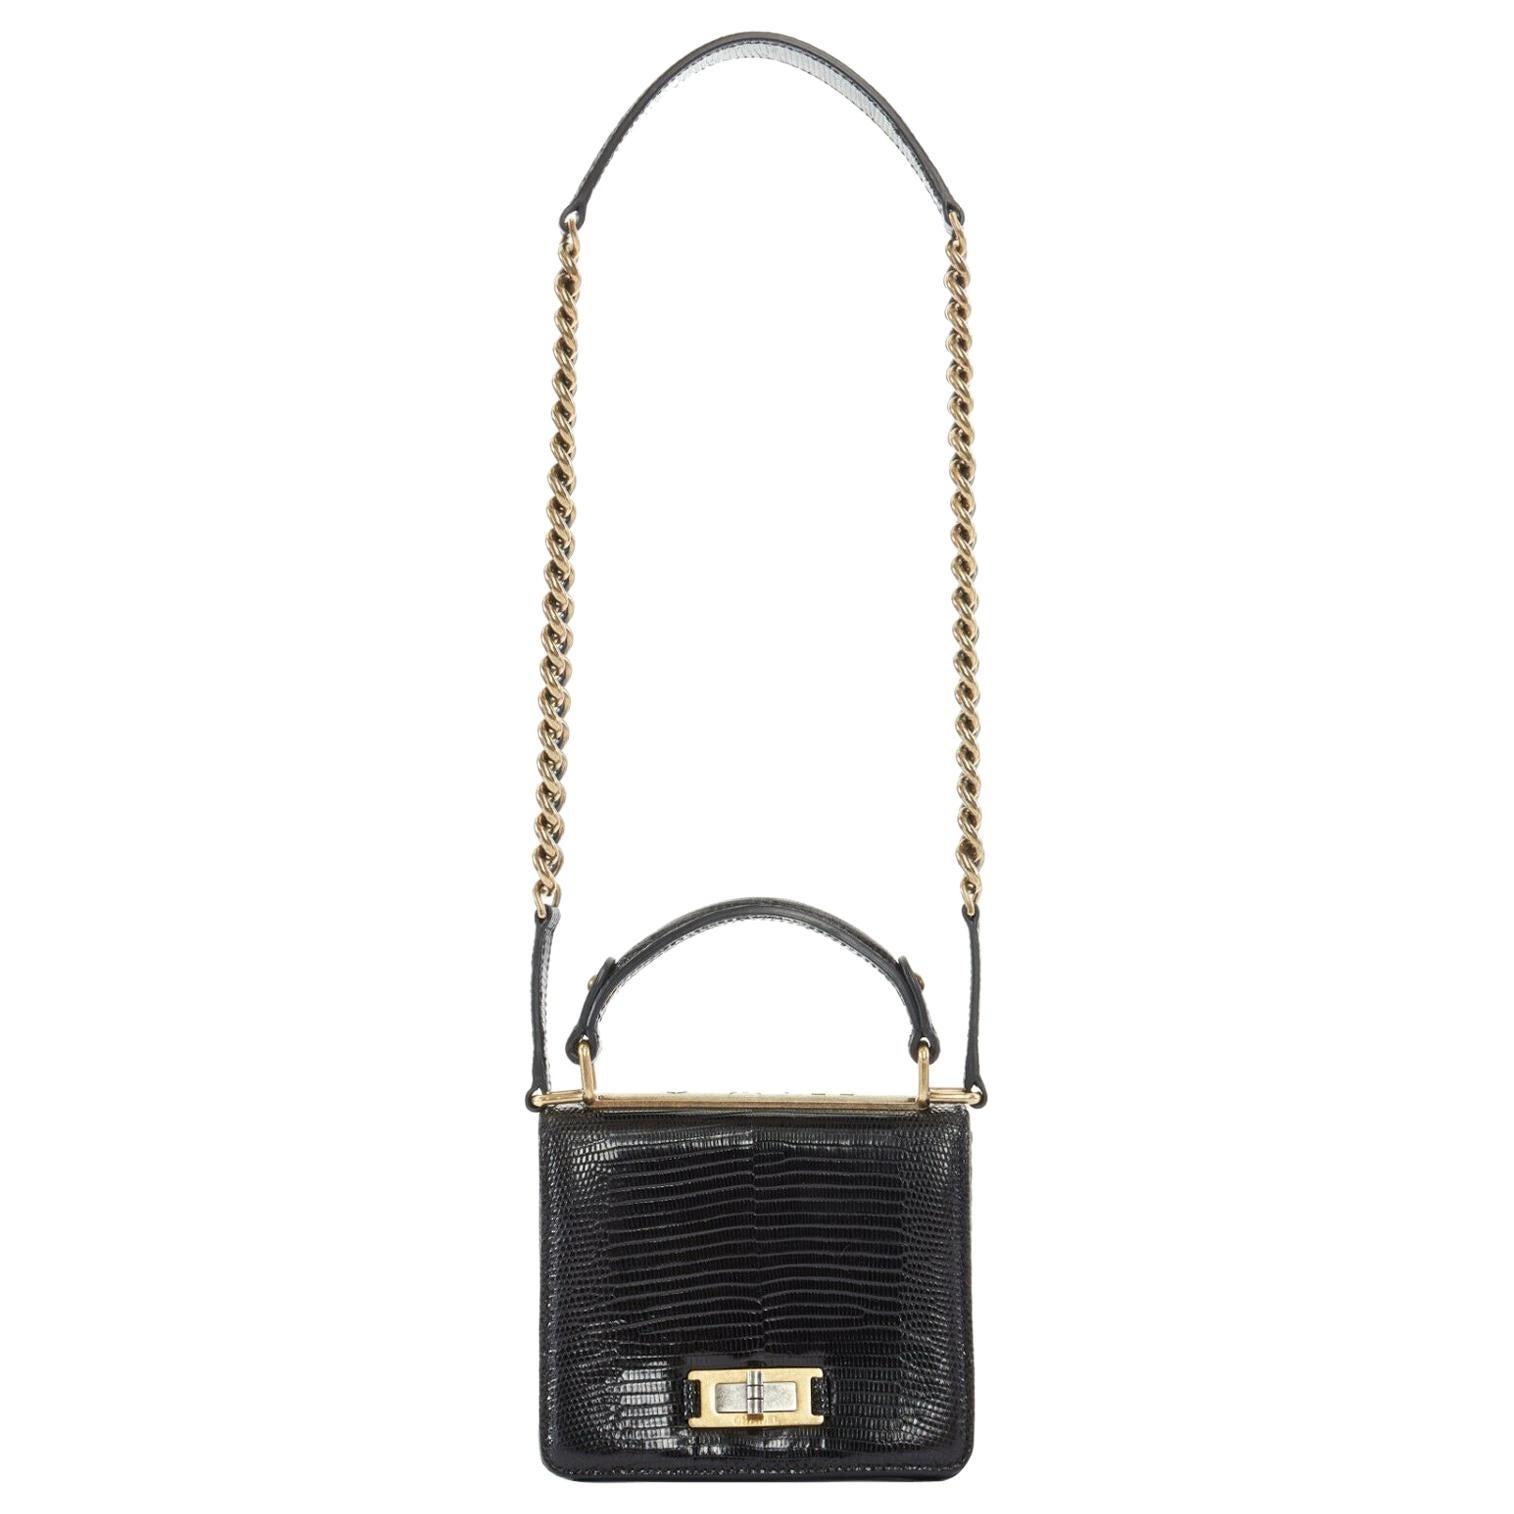 CHANEL black lizard leather top handle flap turn lock gold chain shoulder bag